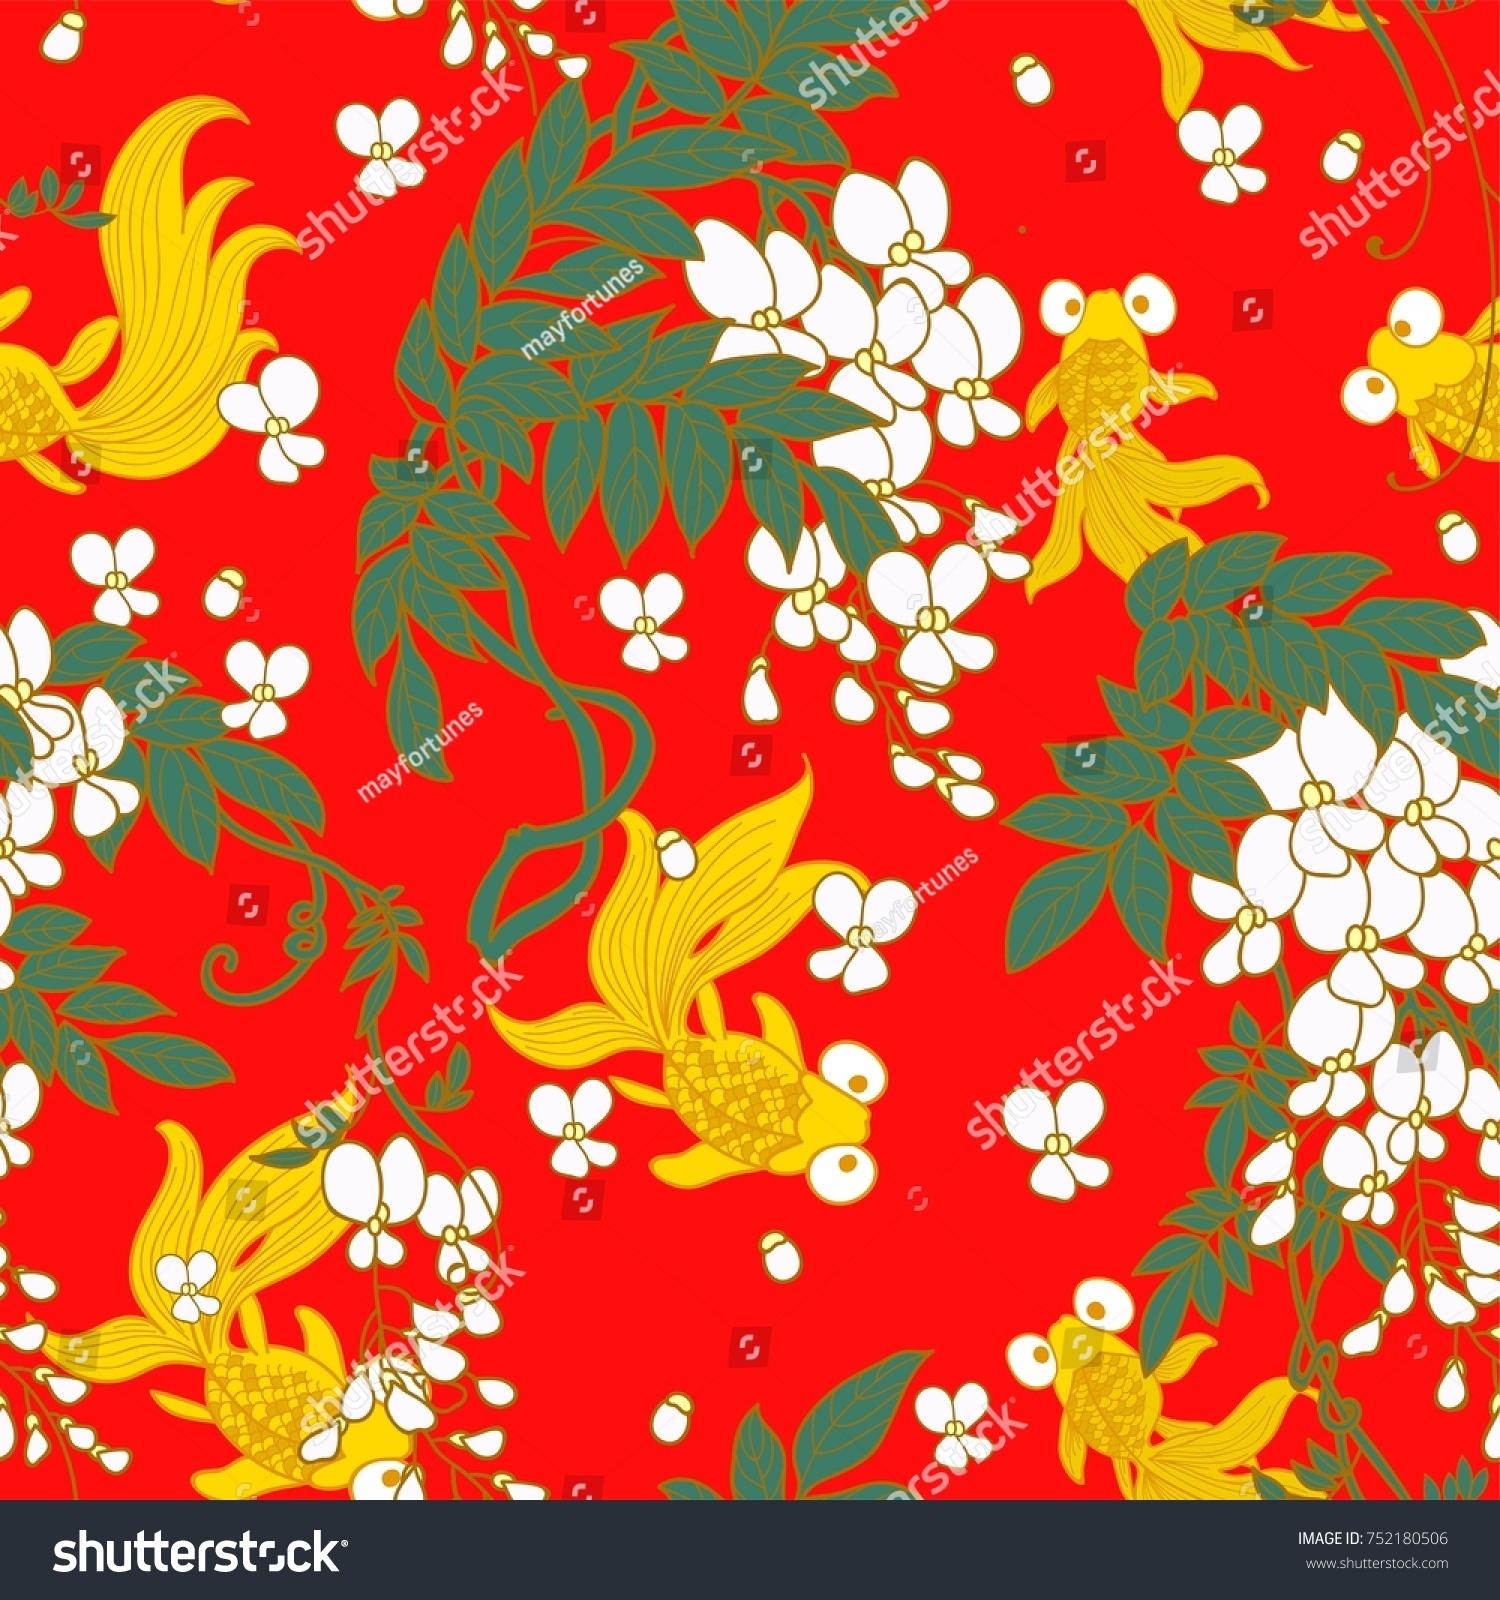 Goldfish Popular Symbols Chinese Art Their Stock Vector Royalty